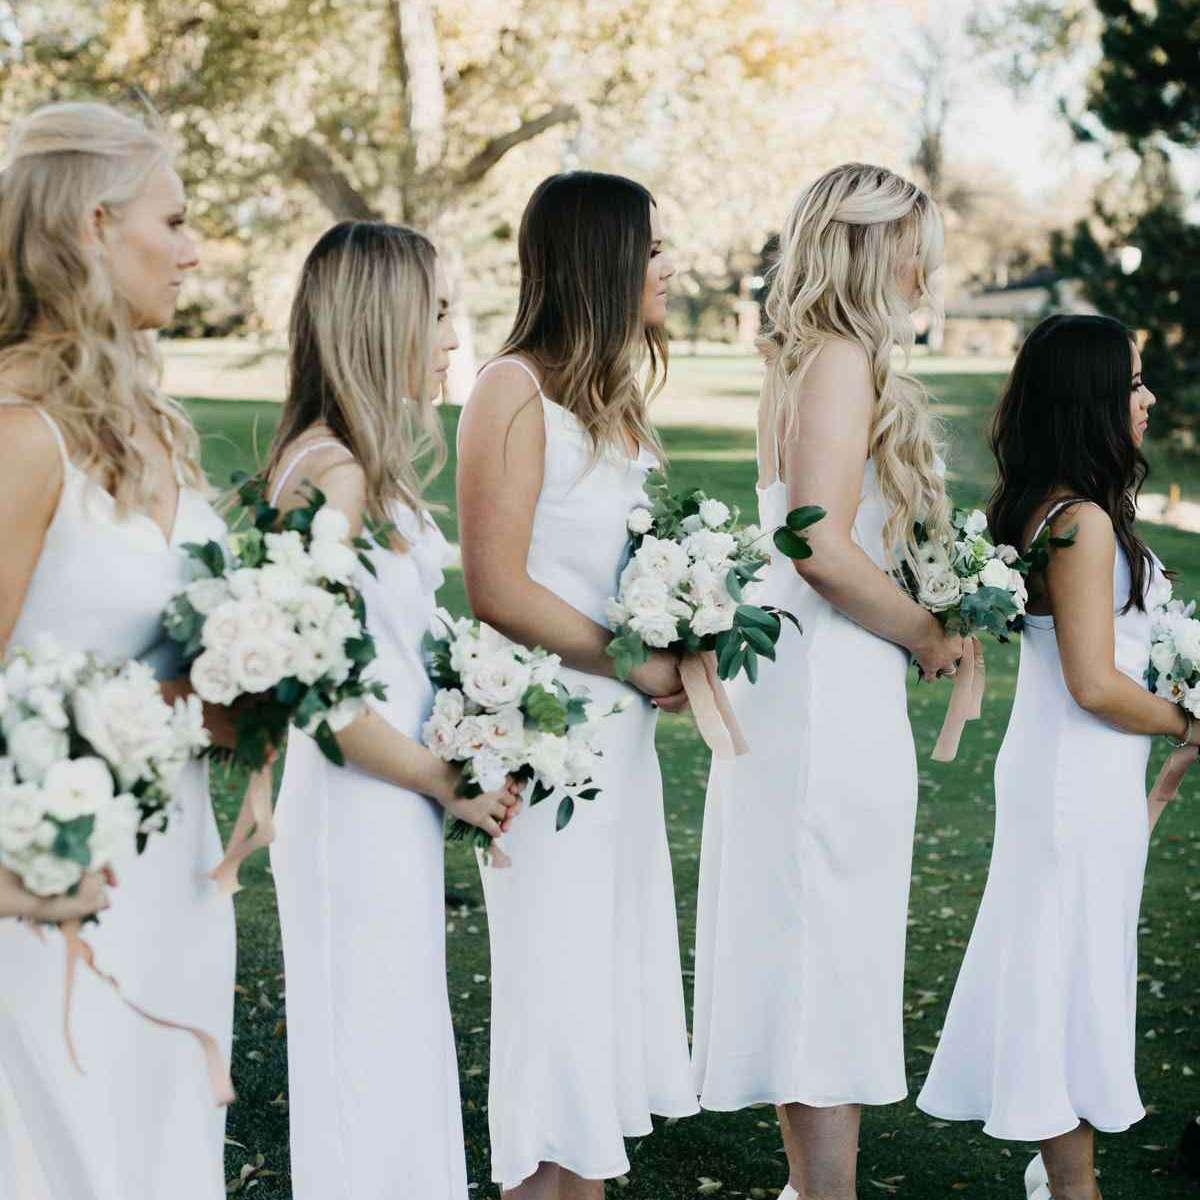 posy wedding bouquet